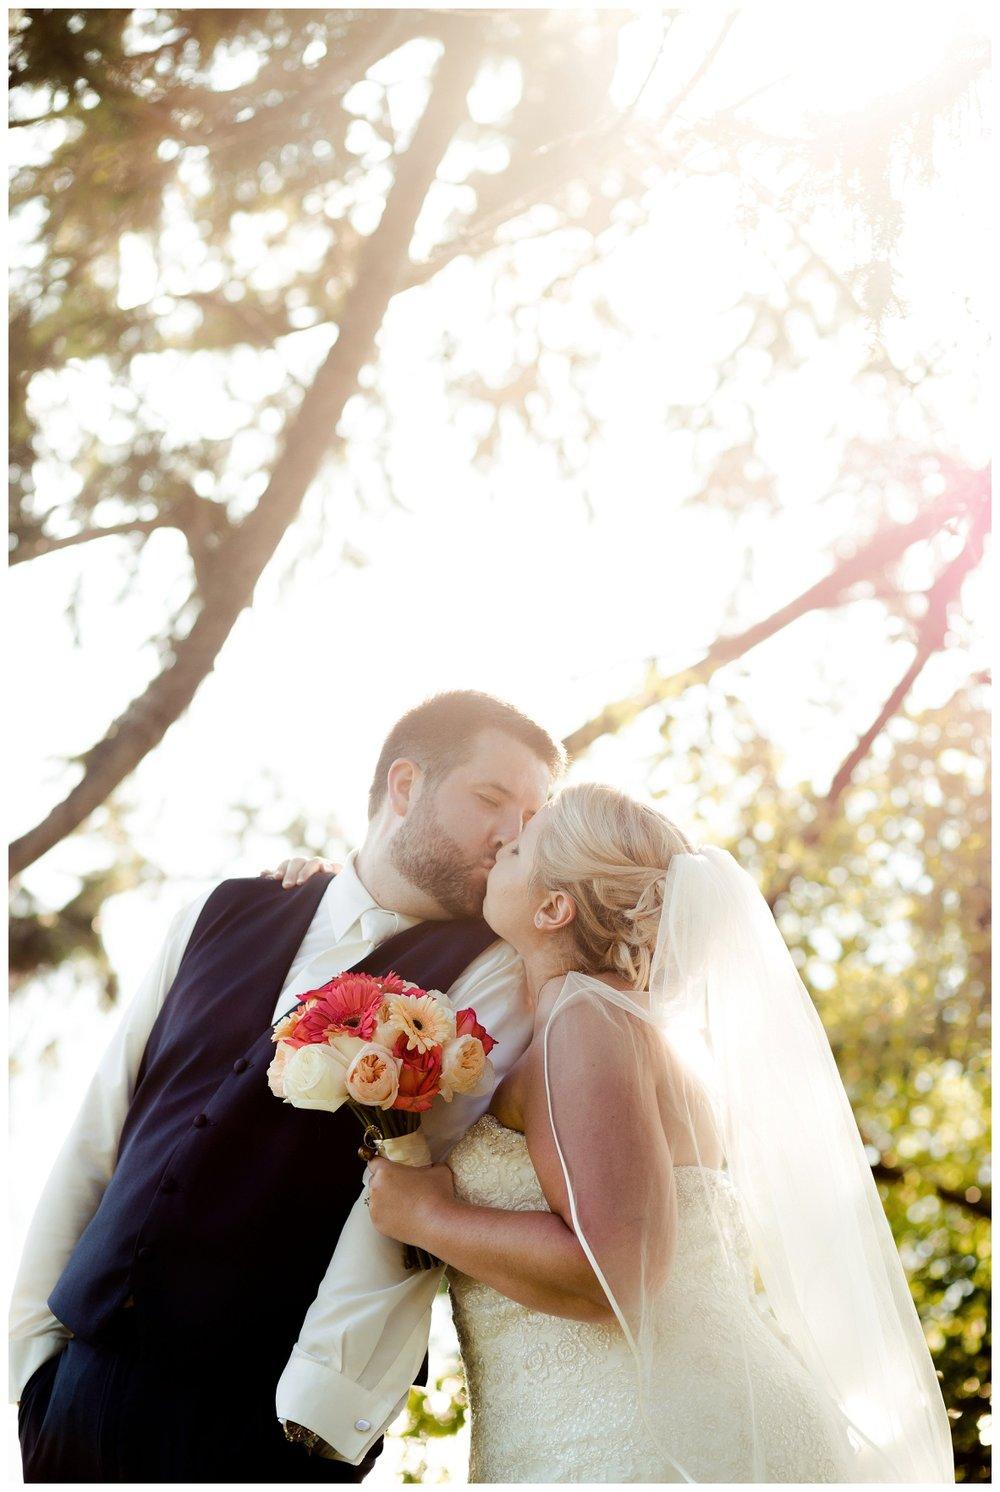 Mr. and Mrs. Kramp_0053.jpg